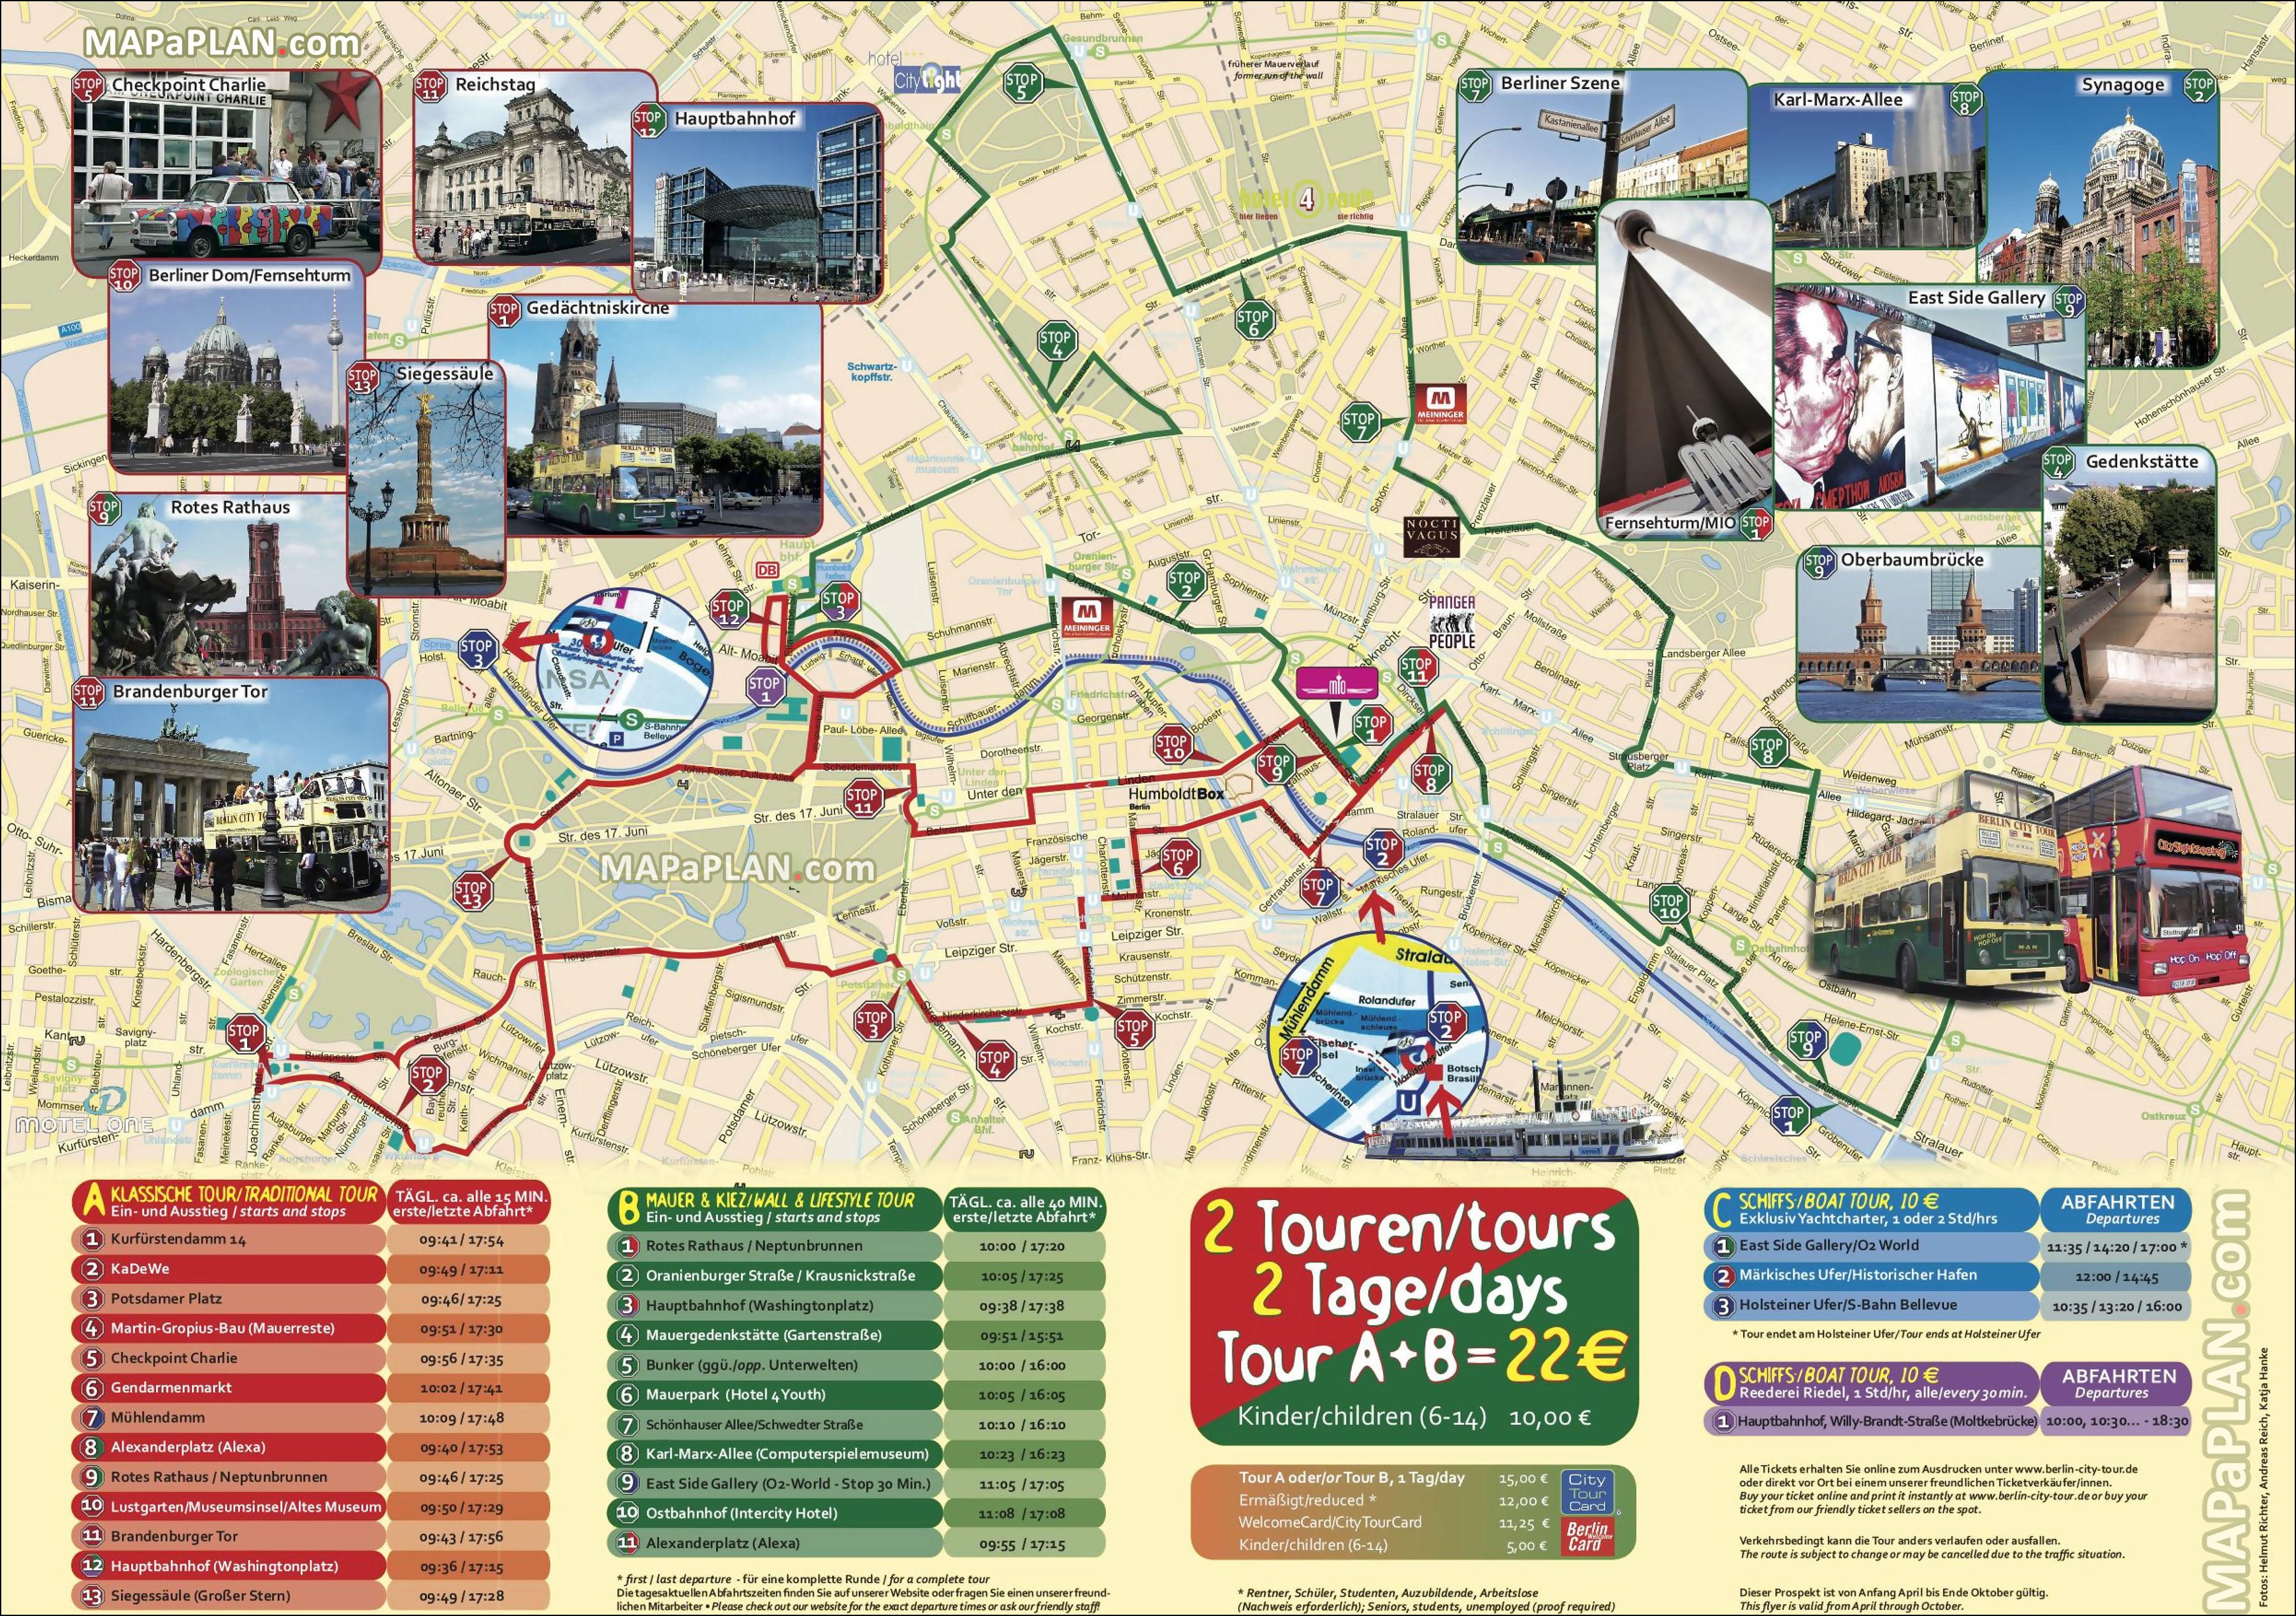 carte touristique de Berlin